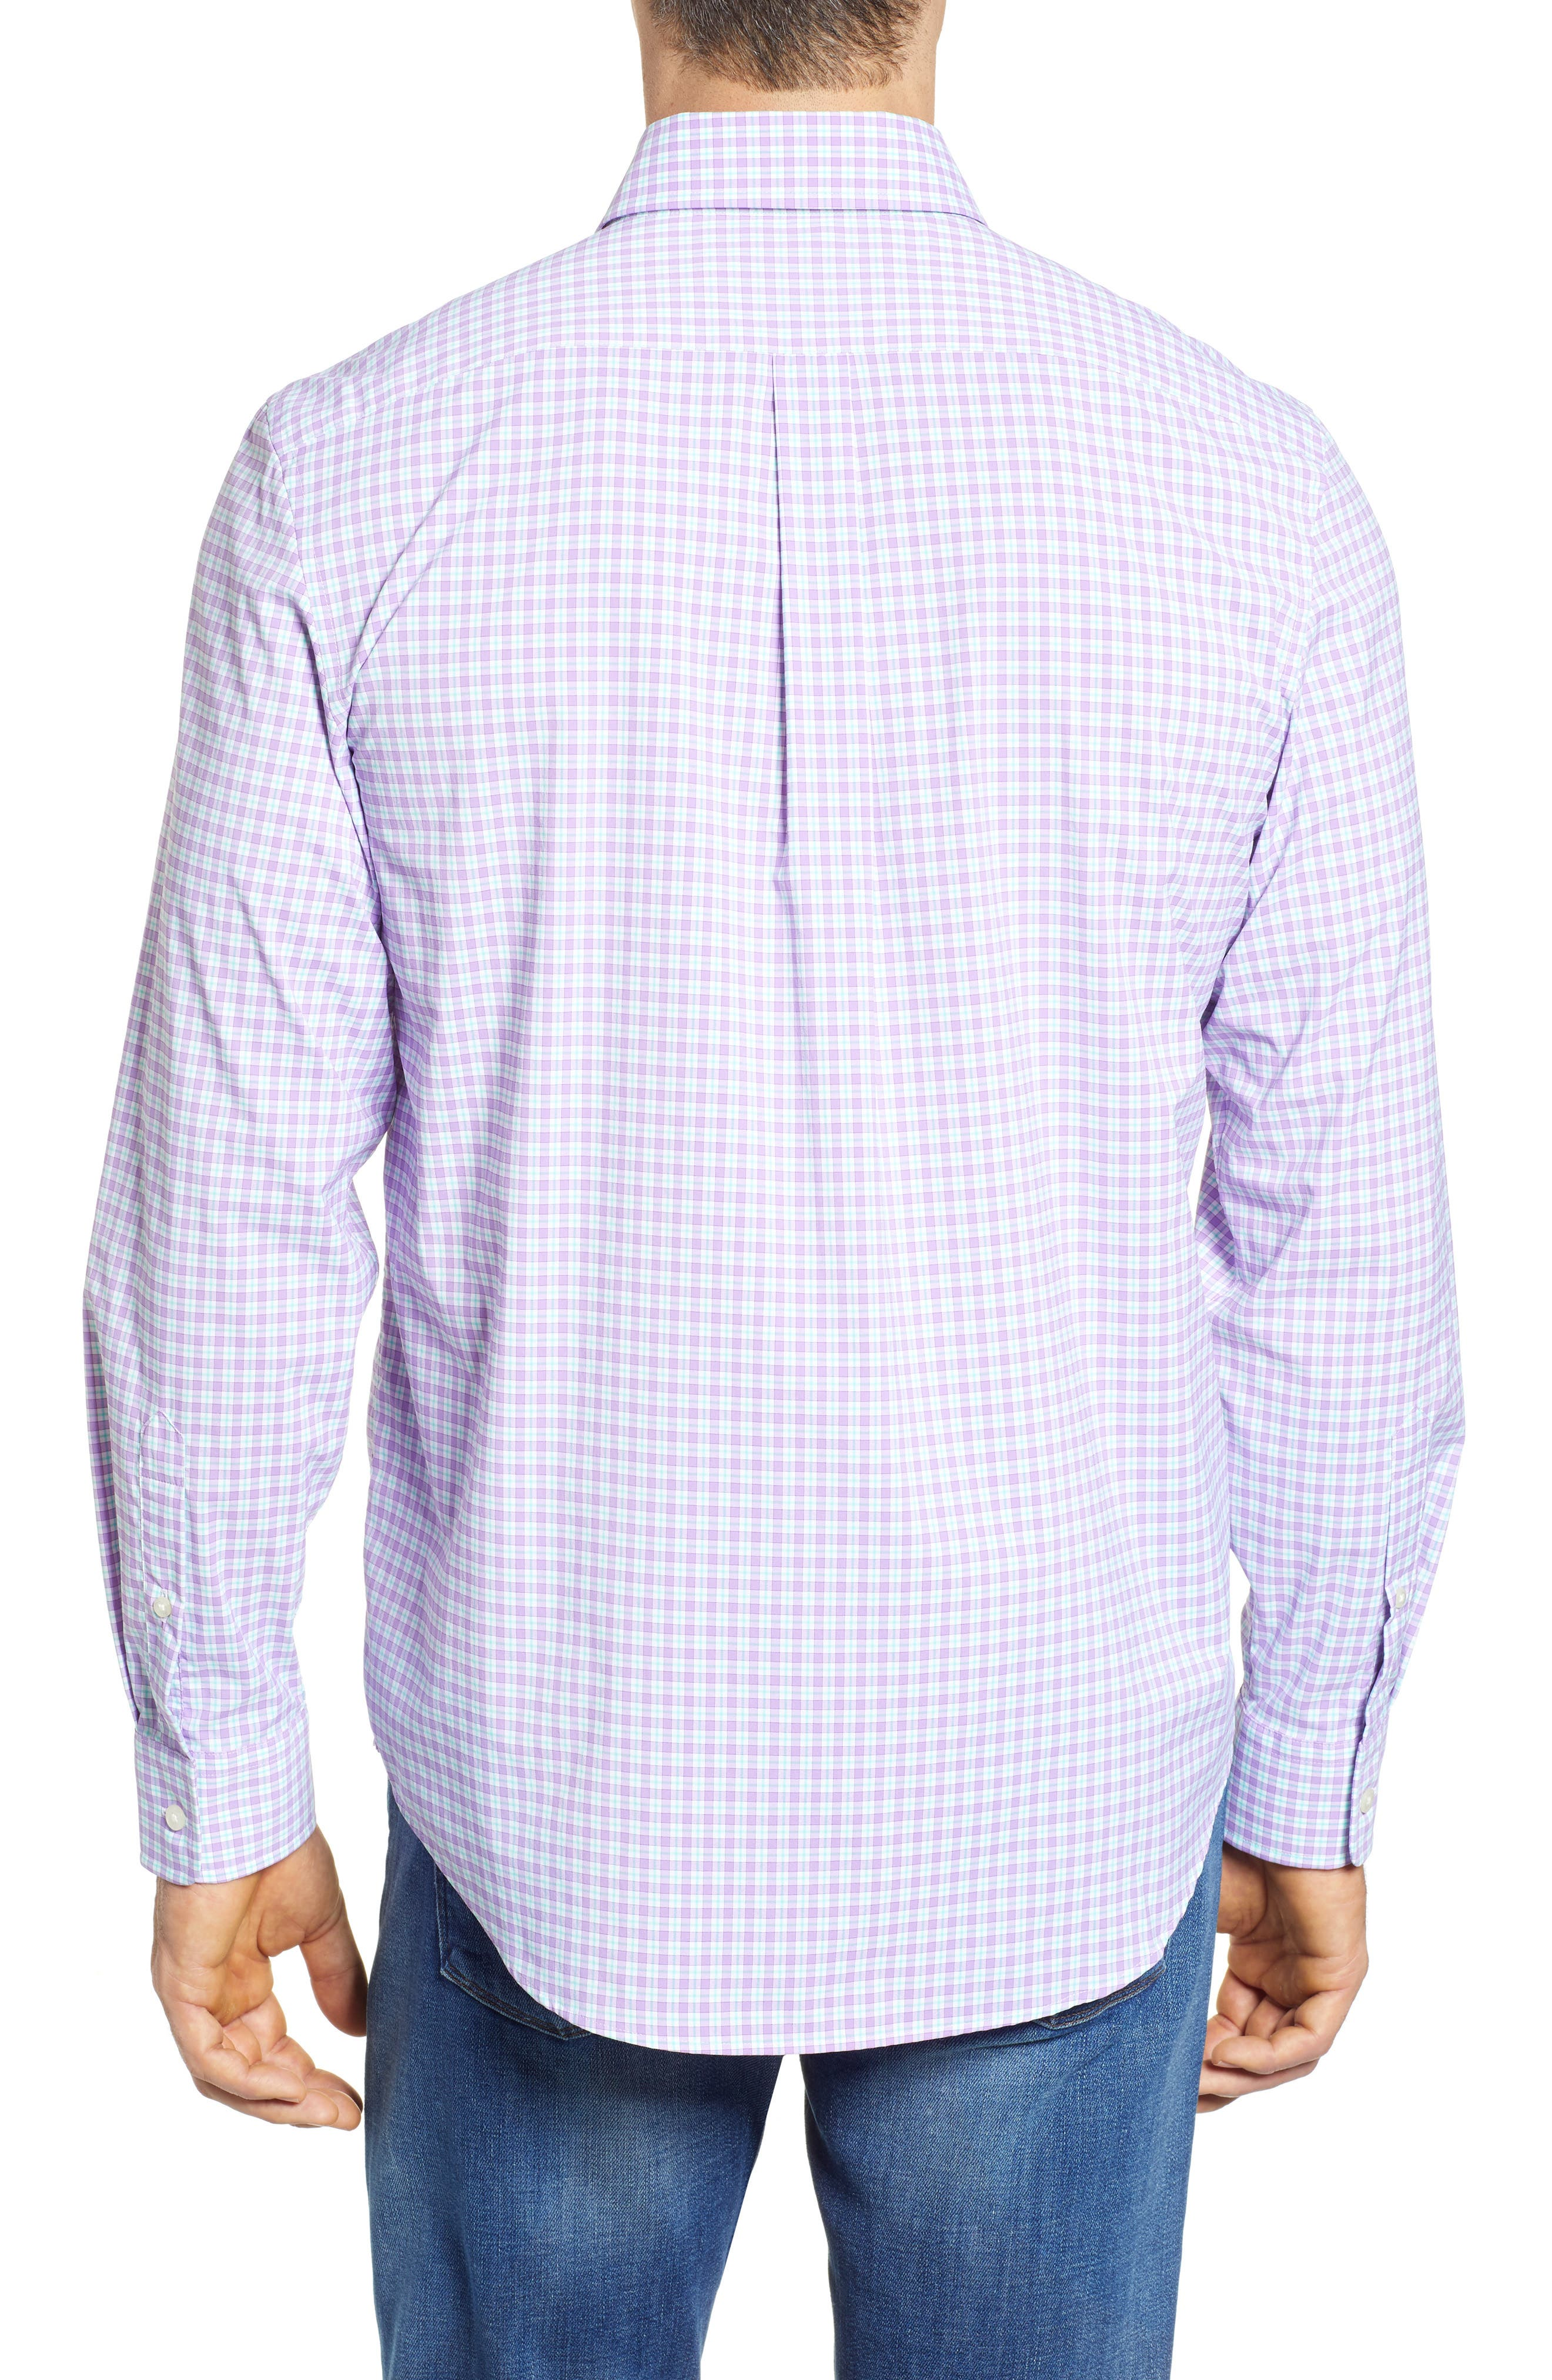 Oyster Pond Slim Fit Plaid Sport Shirt,                             Alternate thumbnail 3, color,                             Sea Urchin